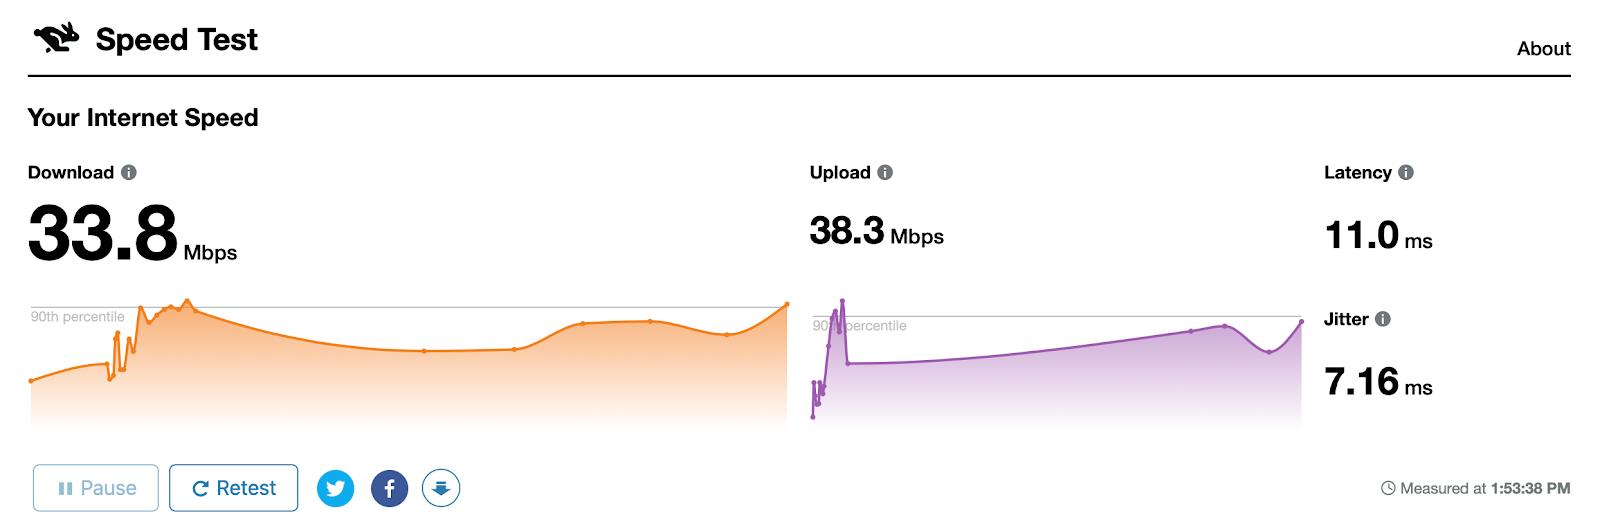 cloudfare speedtest internet speed mac